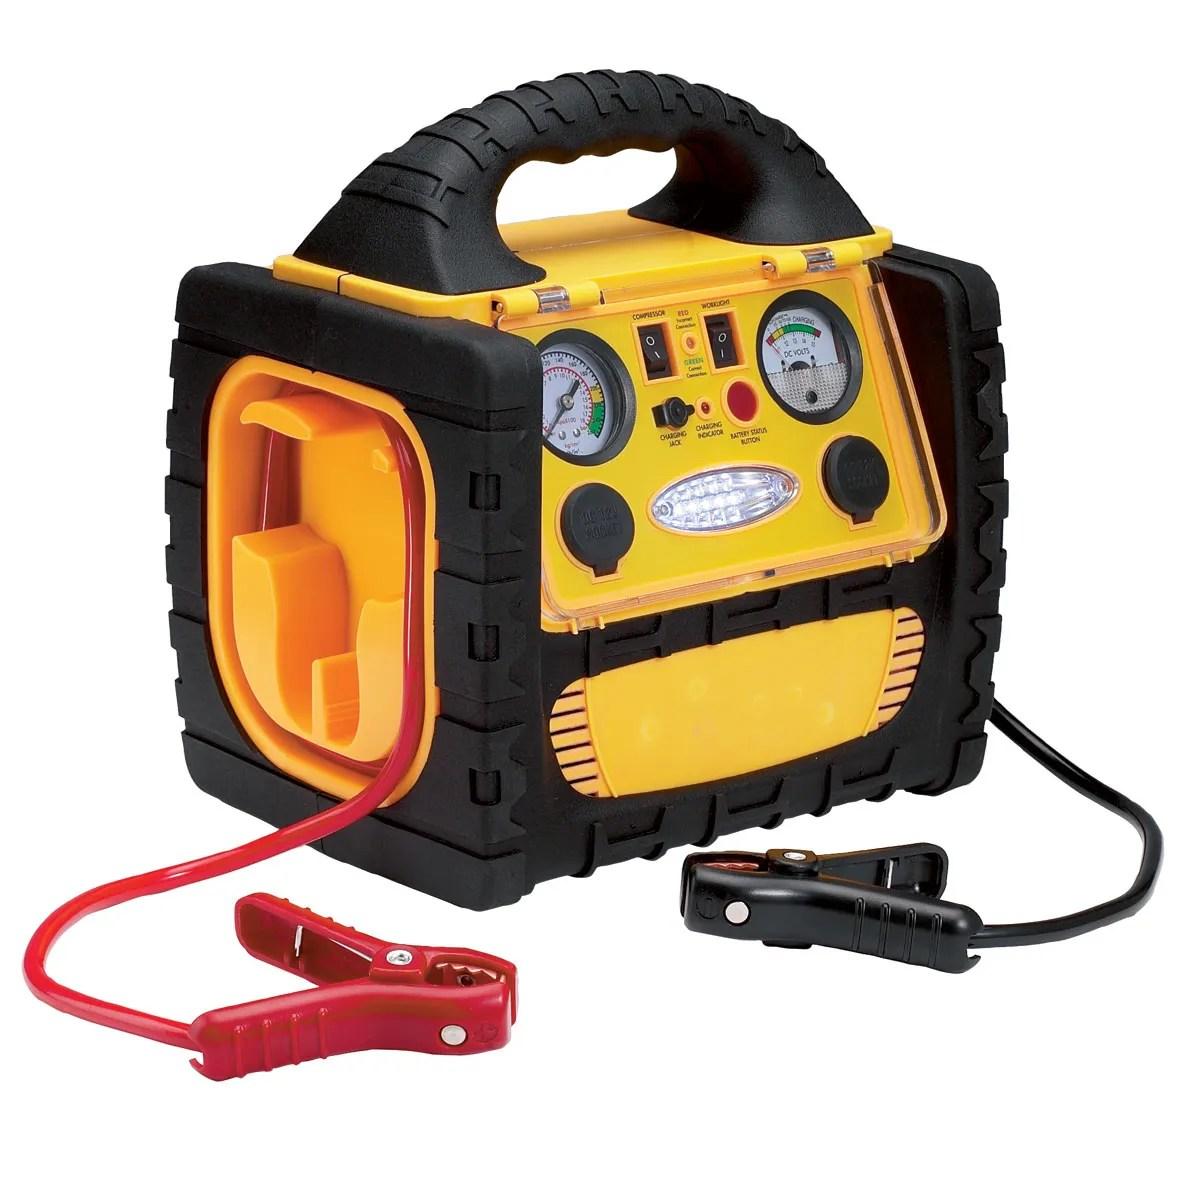 Portable Emergency Power Supply